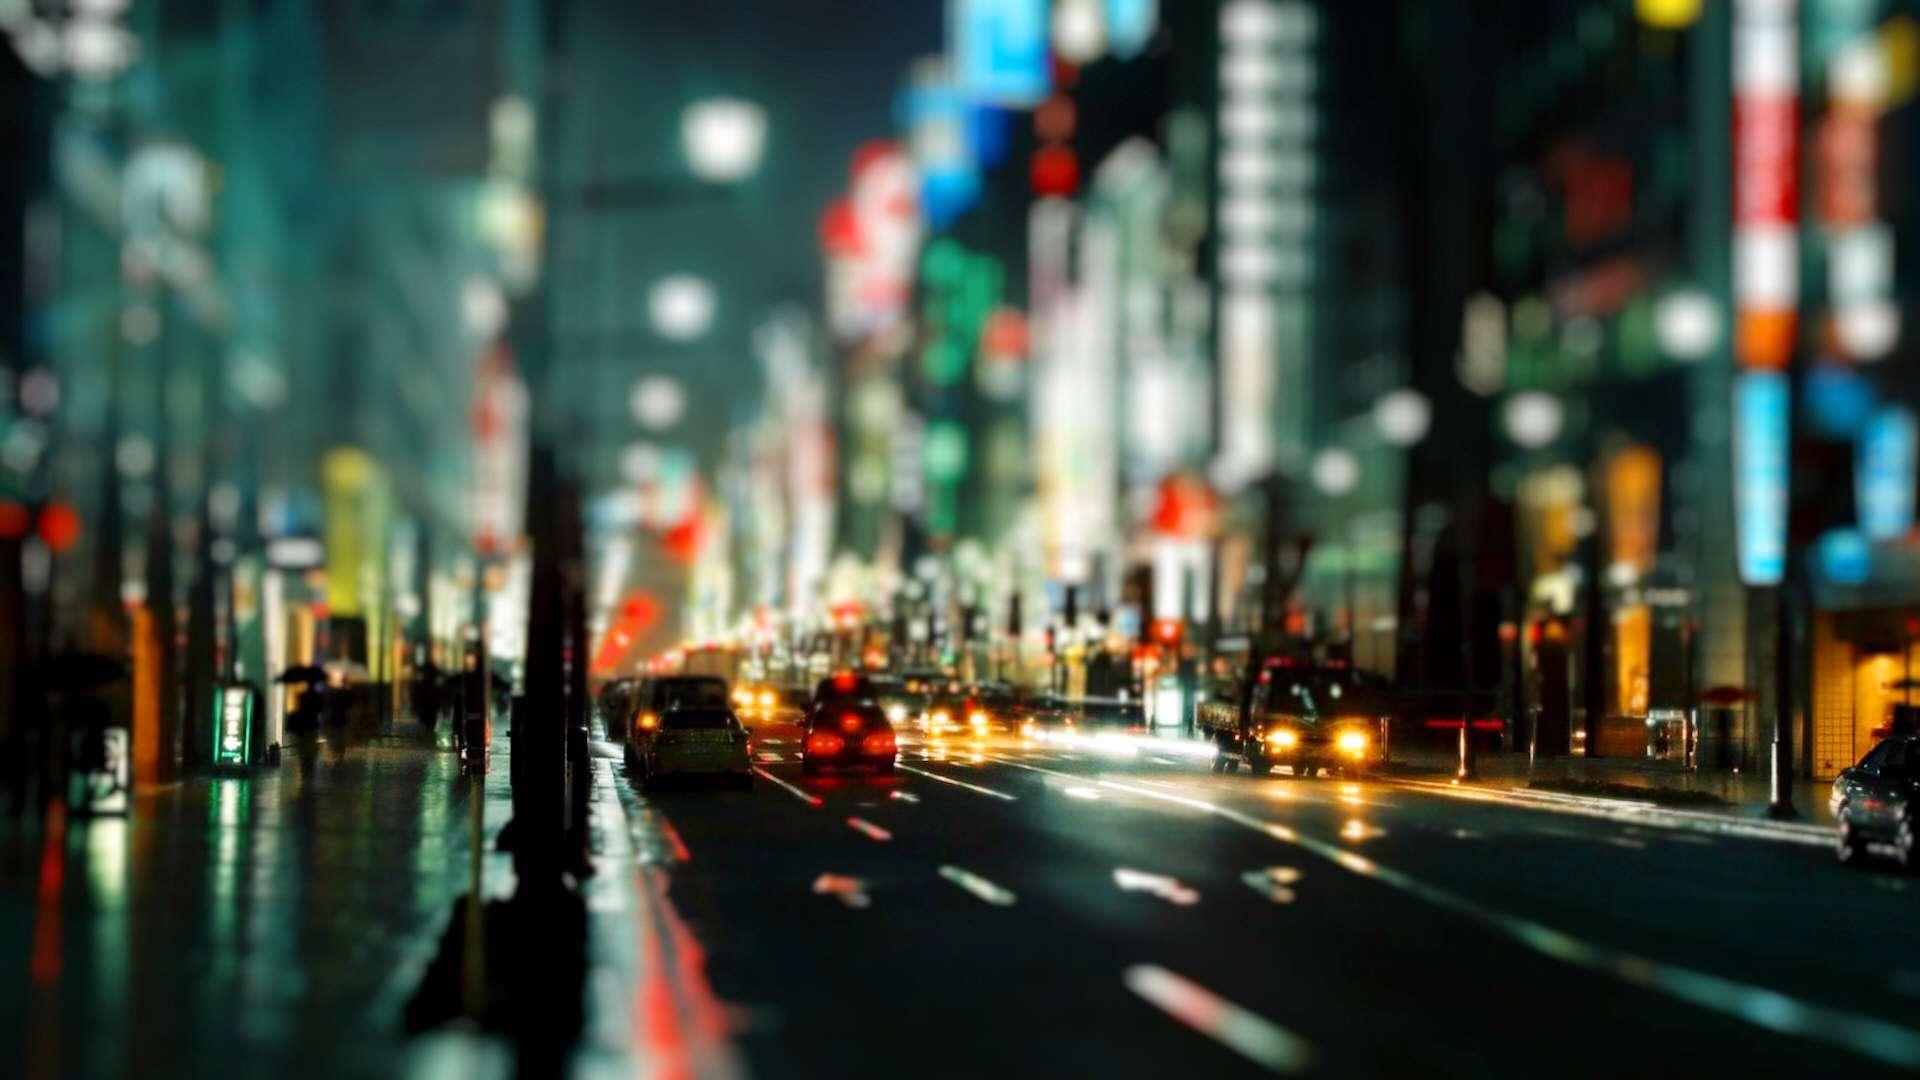 Hd wallpaper city - Tokyo At Night Hd Wallpaper 20034 Wallpaper Wallatar Com